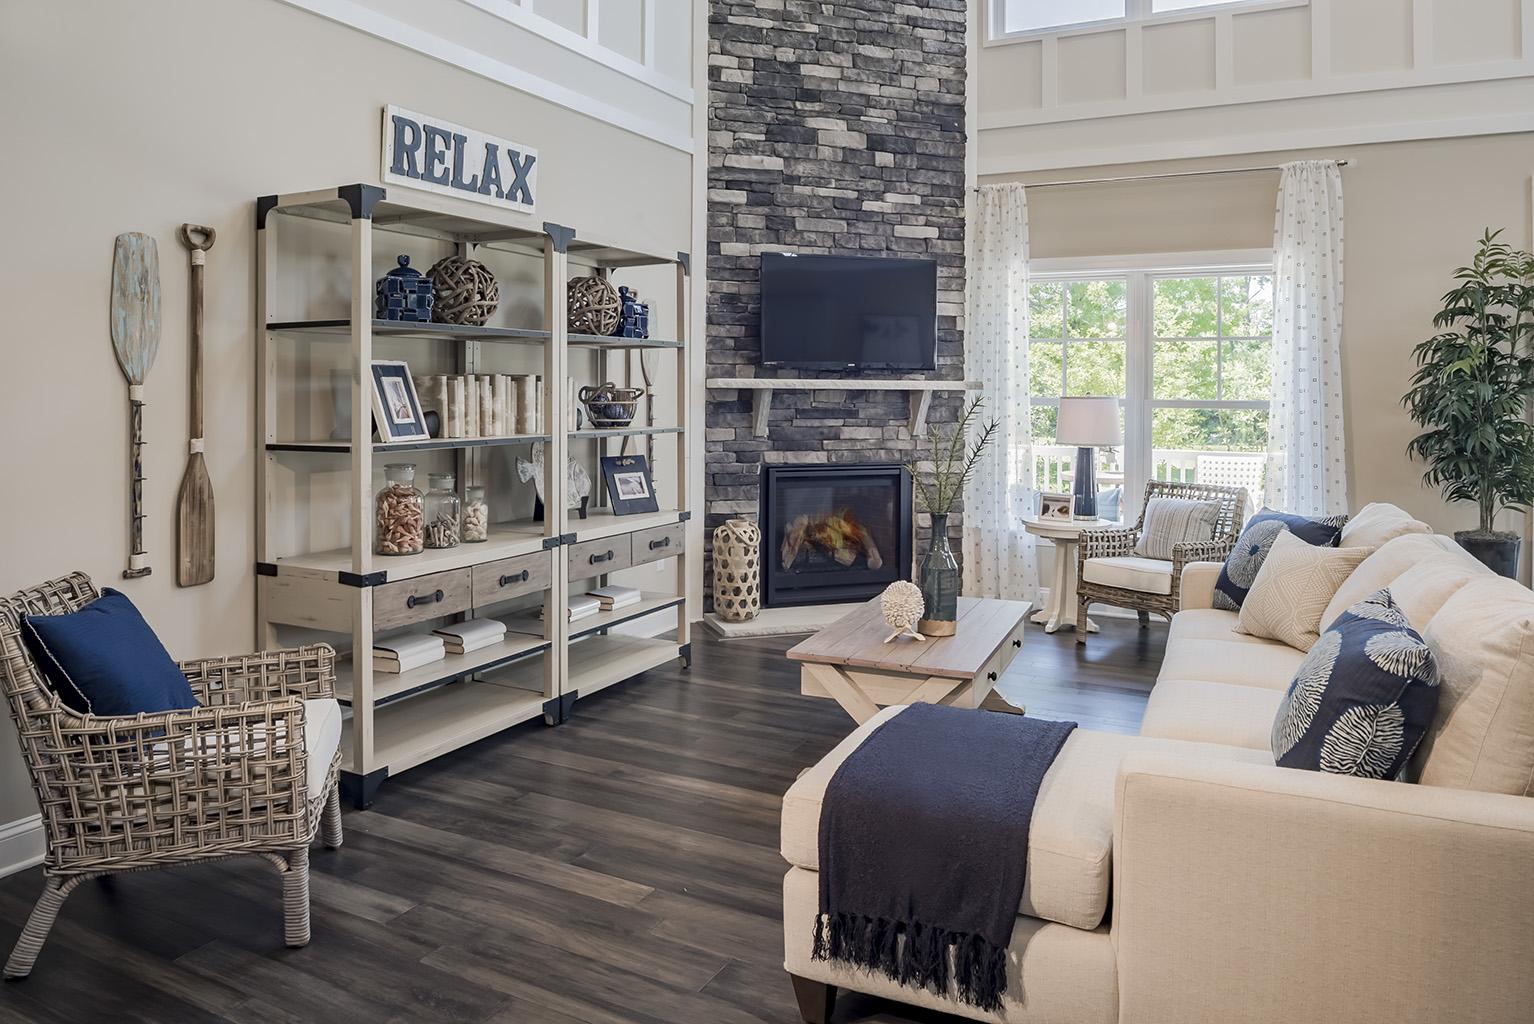 WINNER Single Family Home $350,001-$400,000  Insight Homes - Showfiled - Saltaire Model